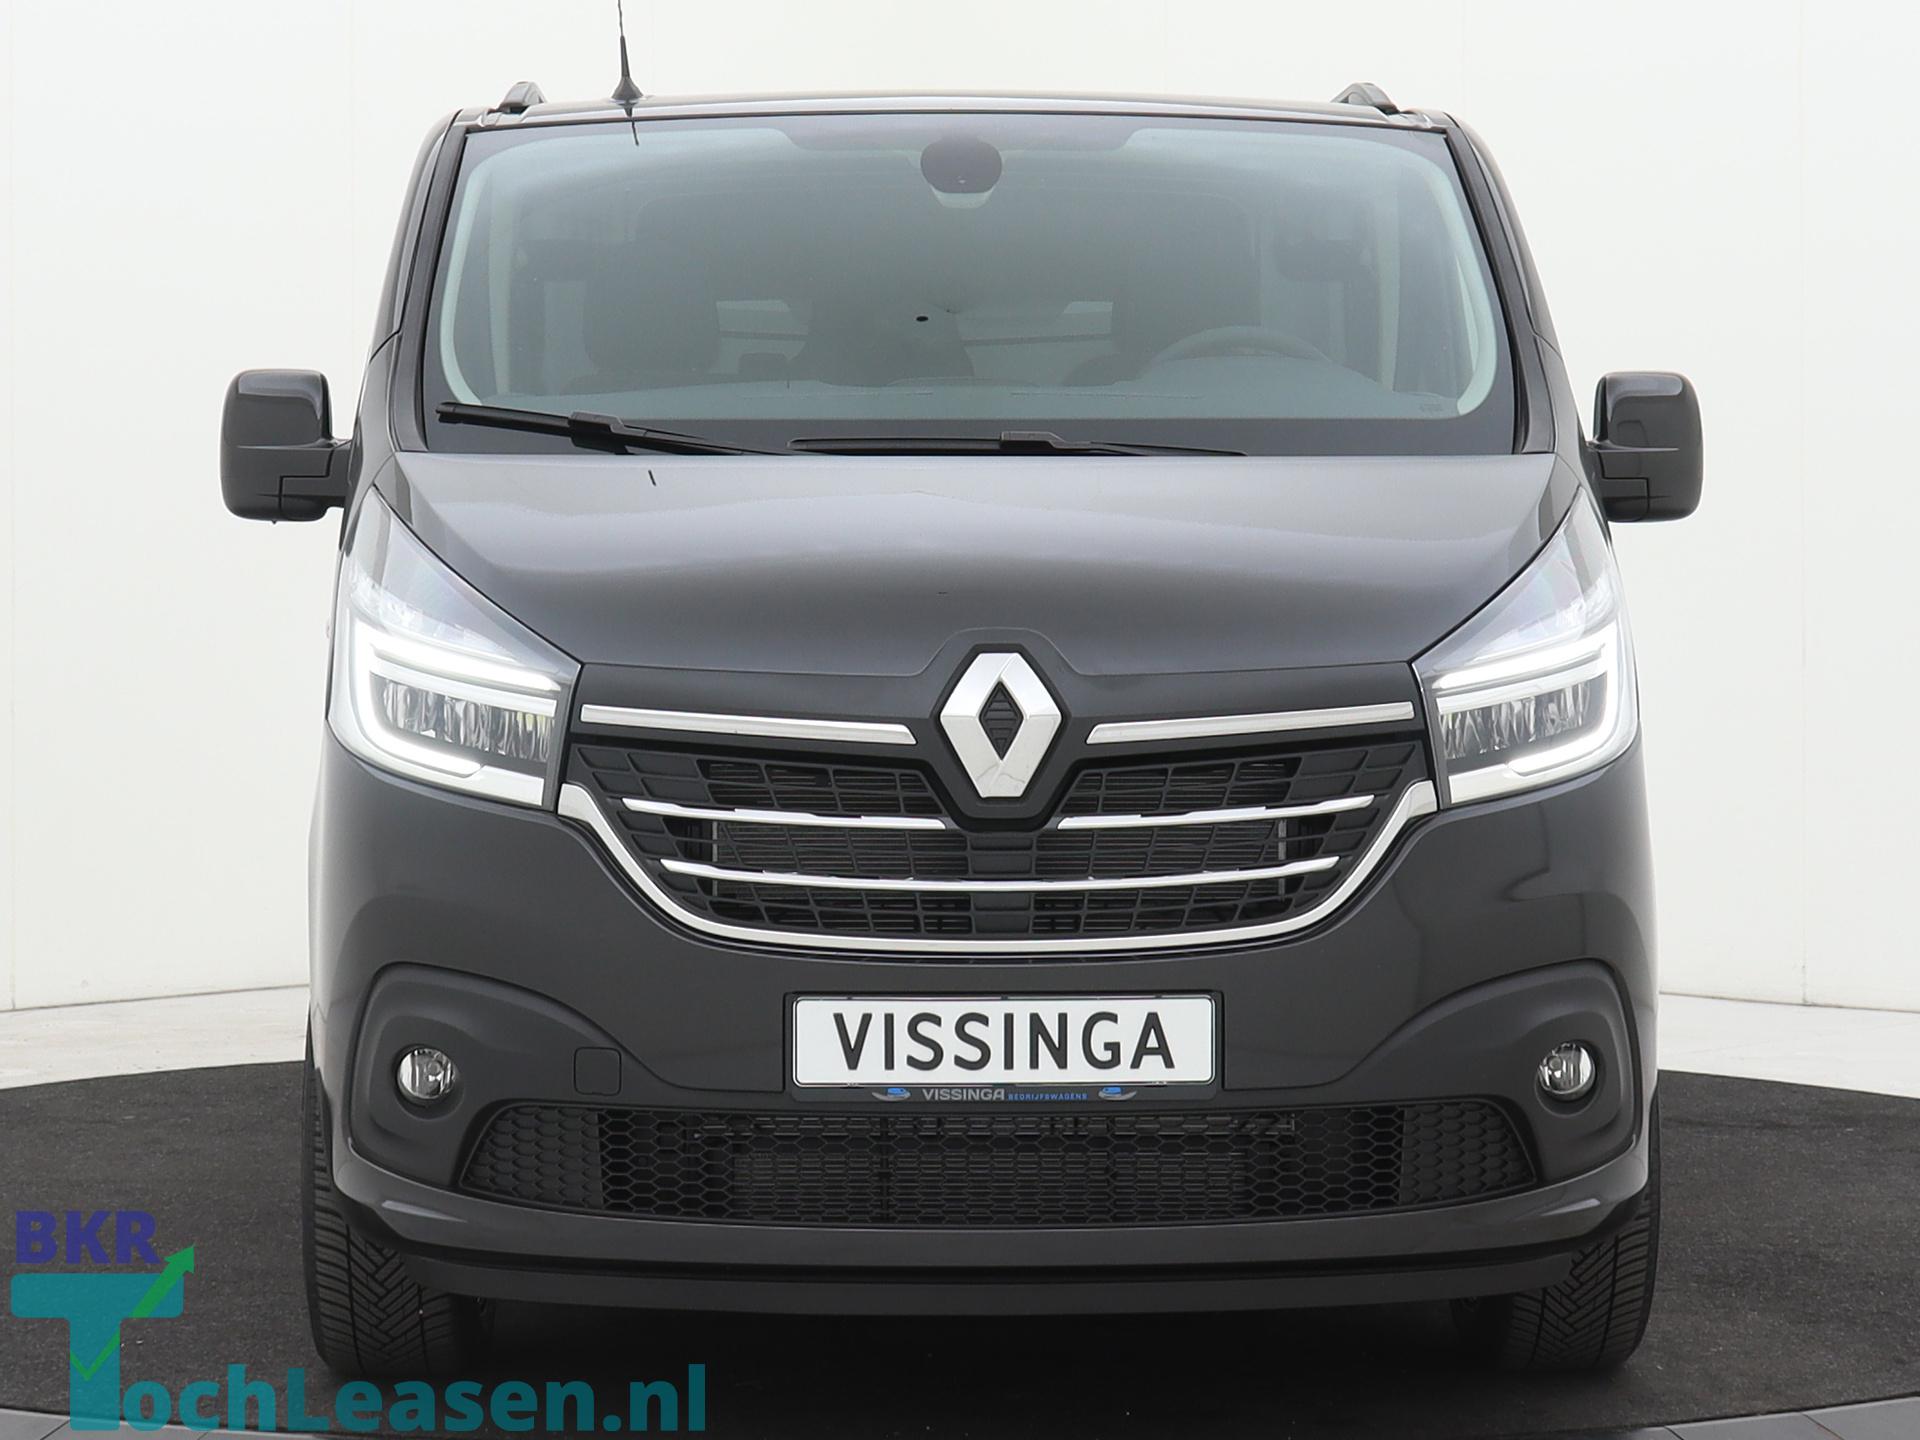 BKRTochLeasen.nl - Renault Trafic - K-Edtion 10